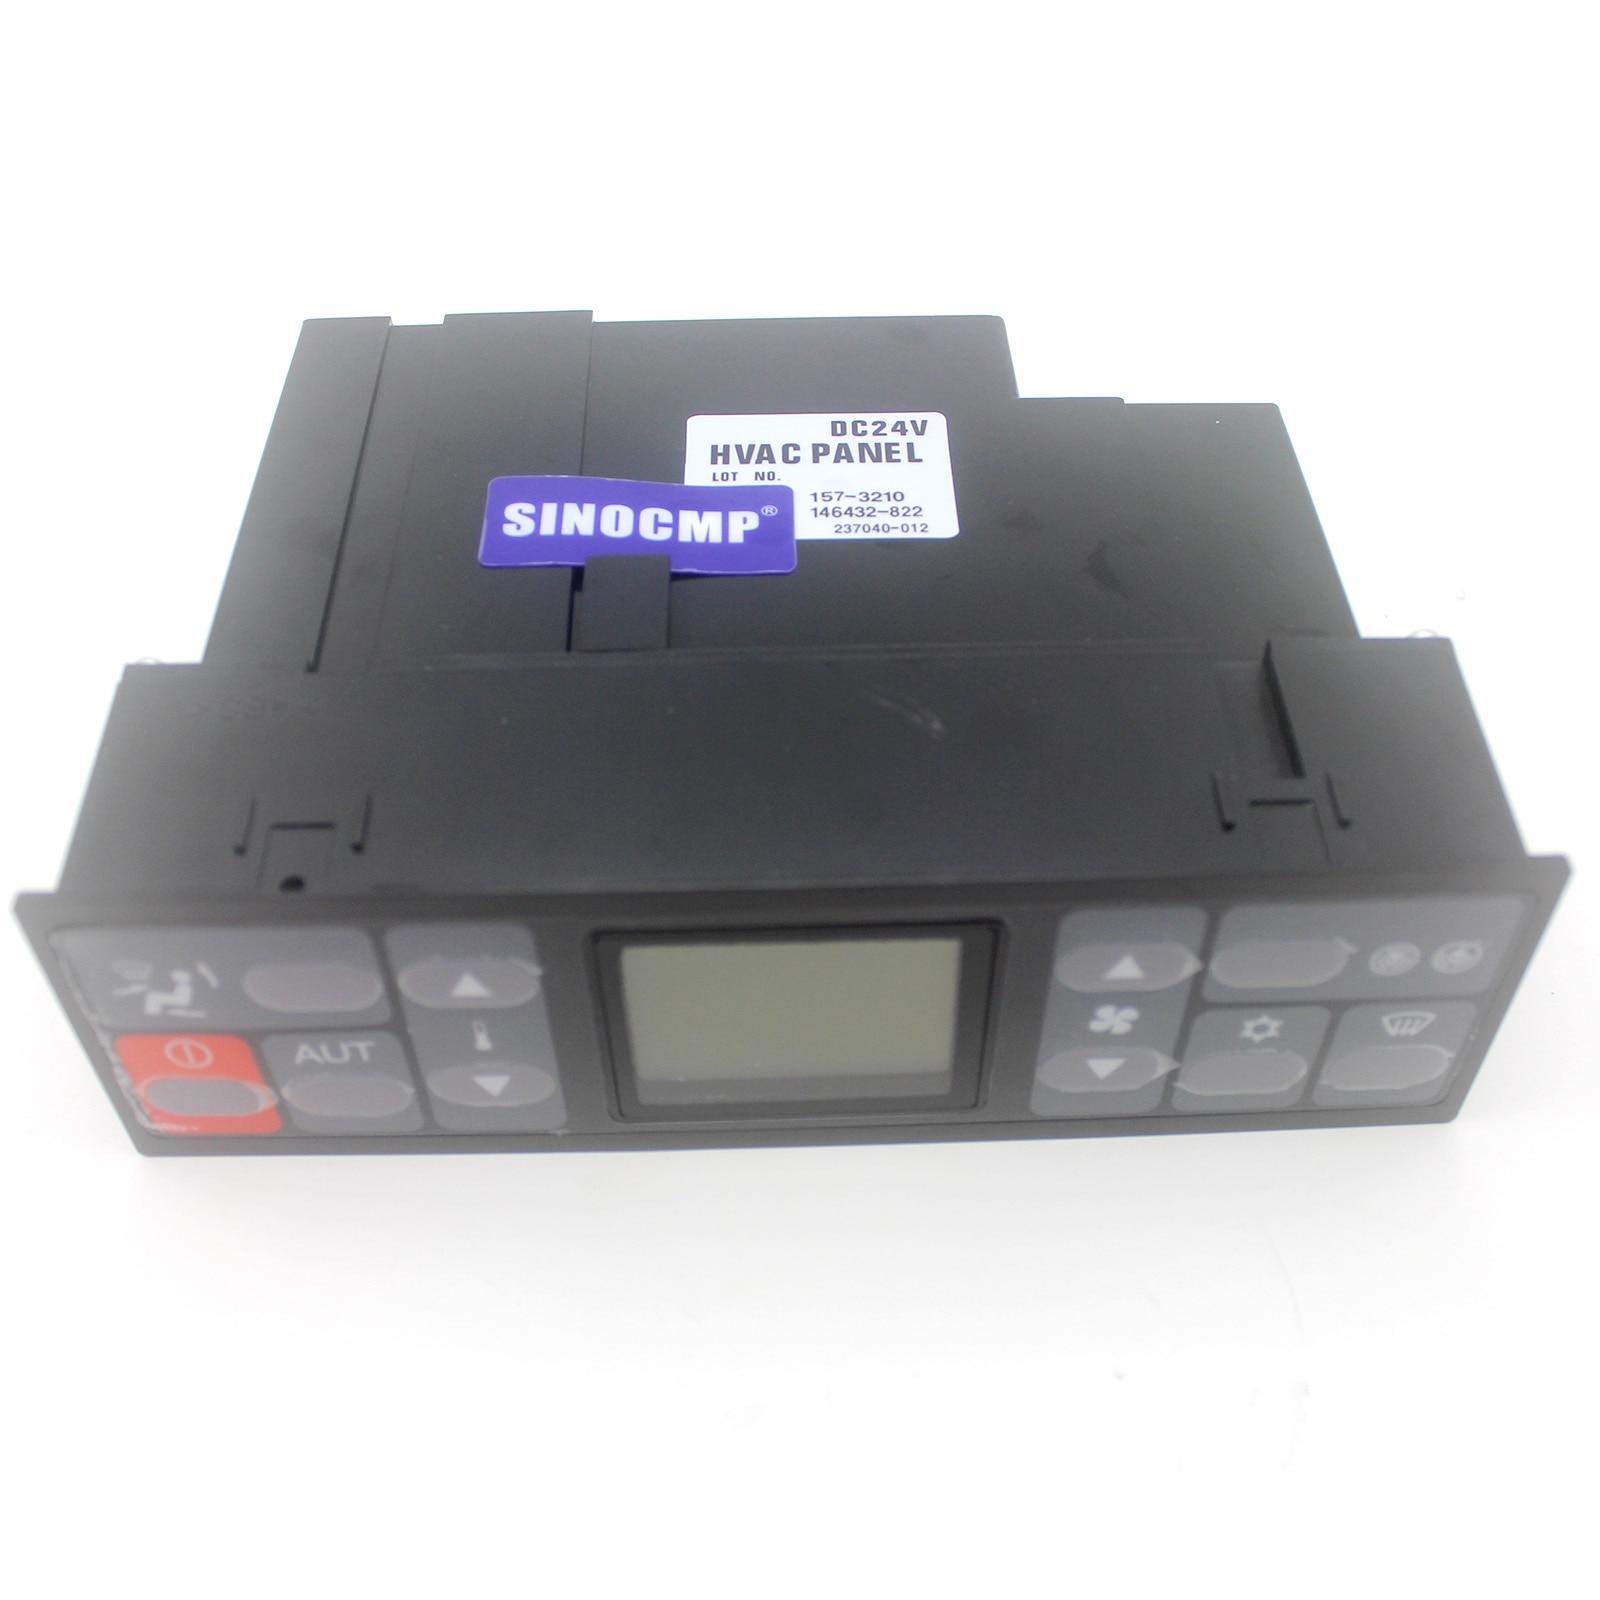 SINOCMP AC التحكم لوحة 157-3210 146432-822 للحفارات 320C 325C 330C E320C E325C E330